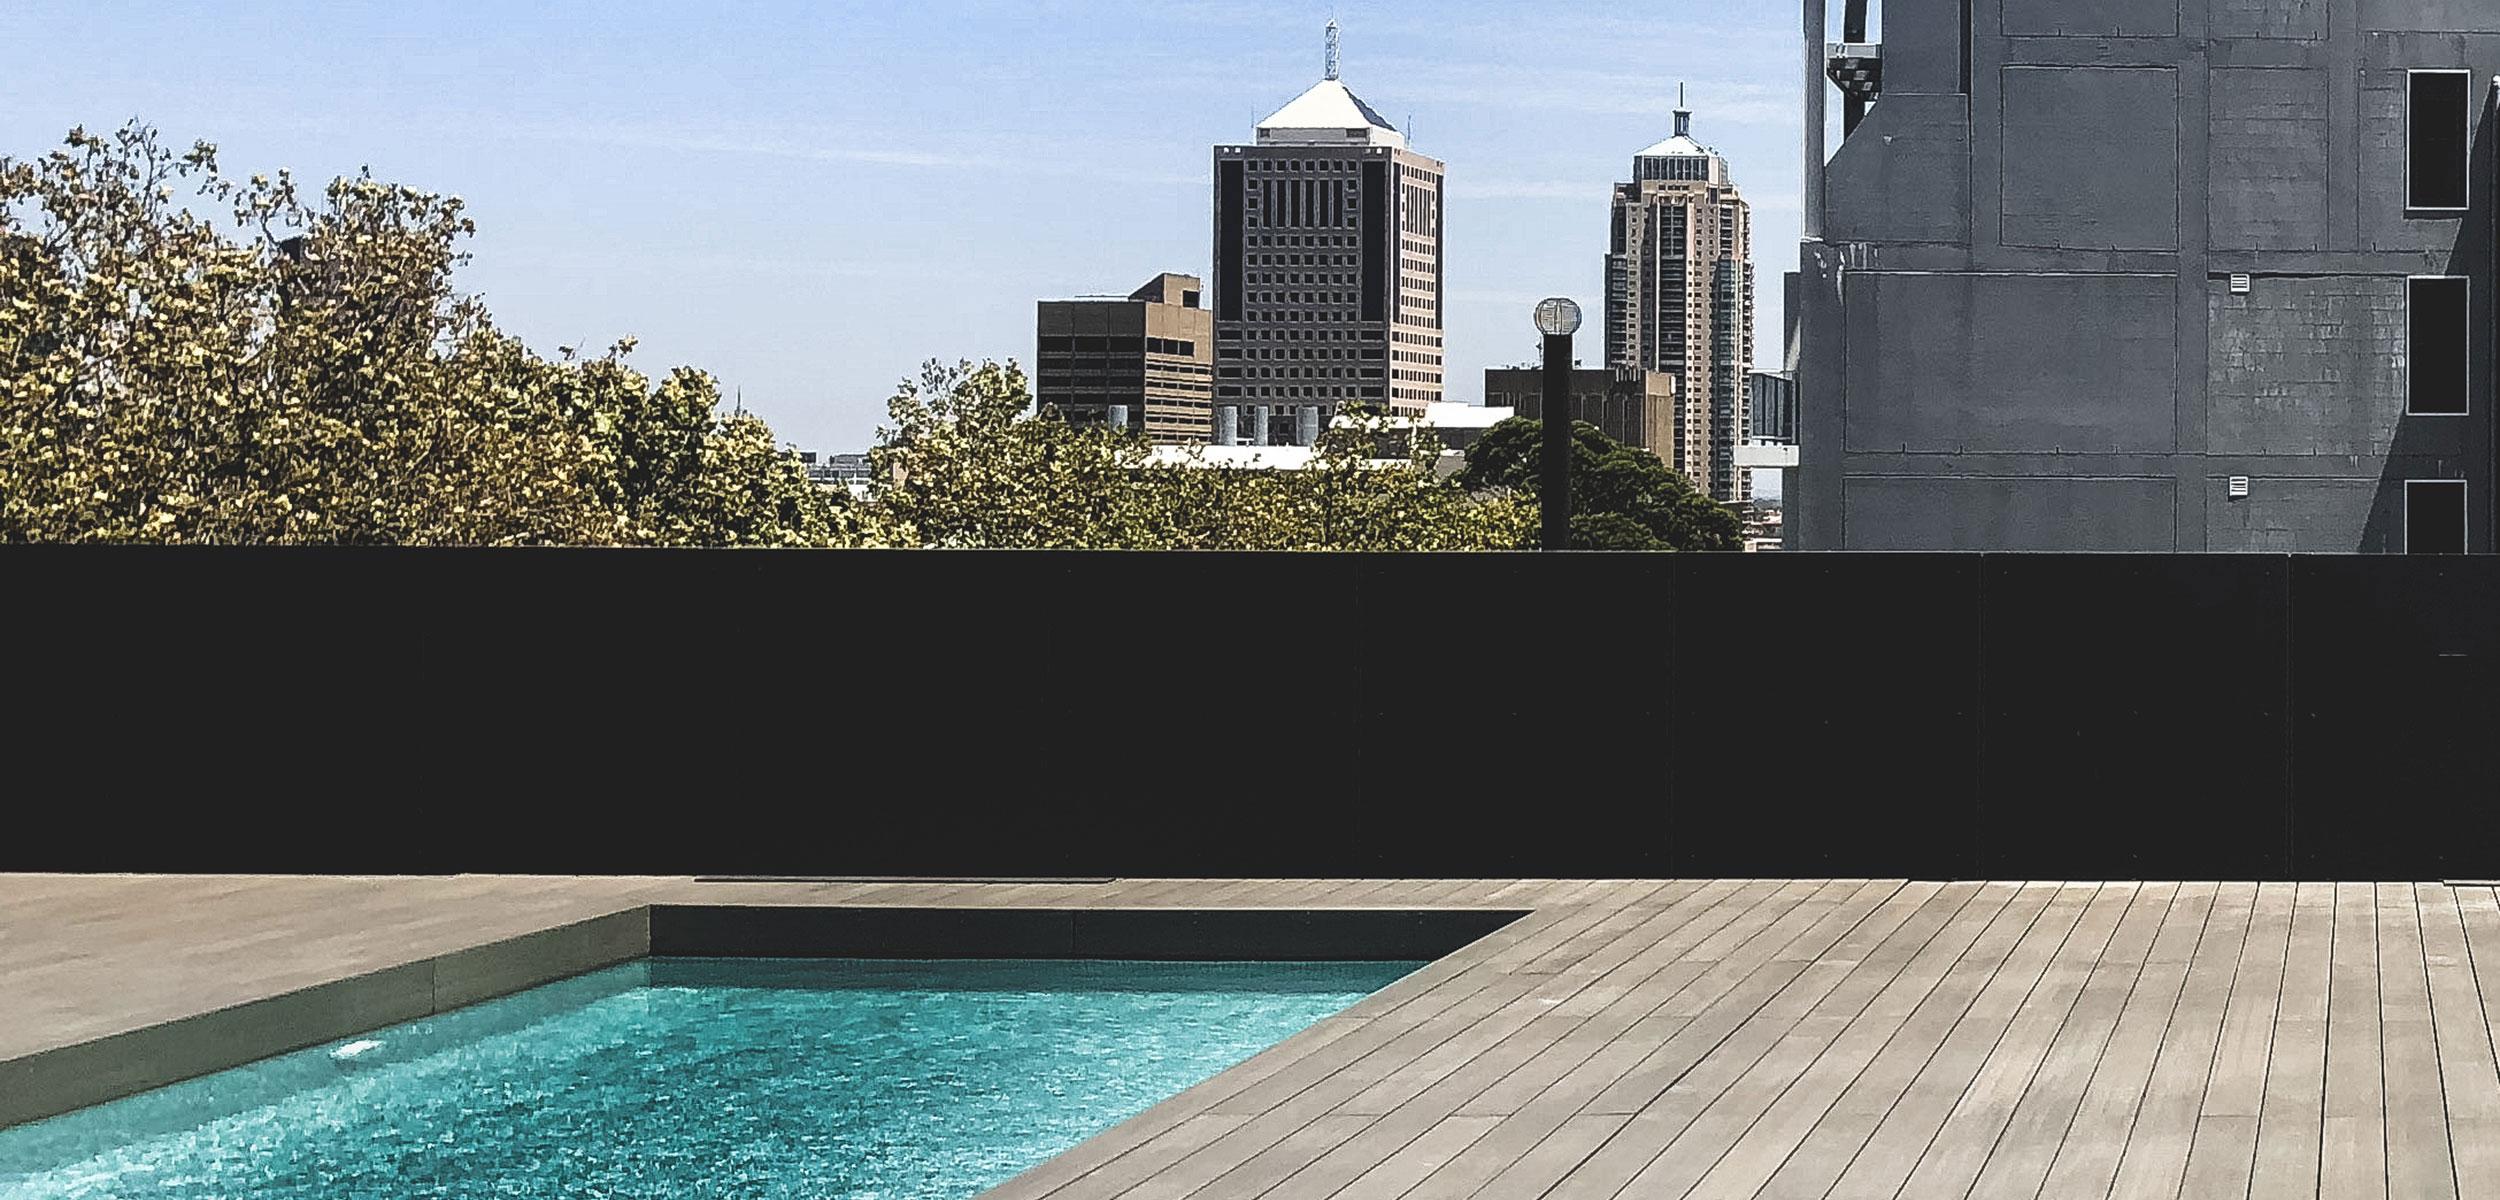 Crown_St_Roof_terrace_2500x1200.jpg